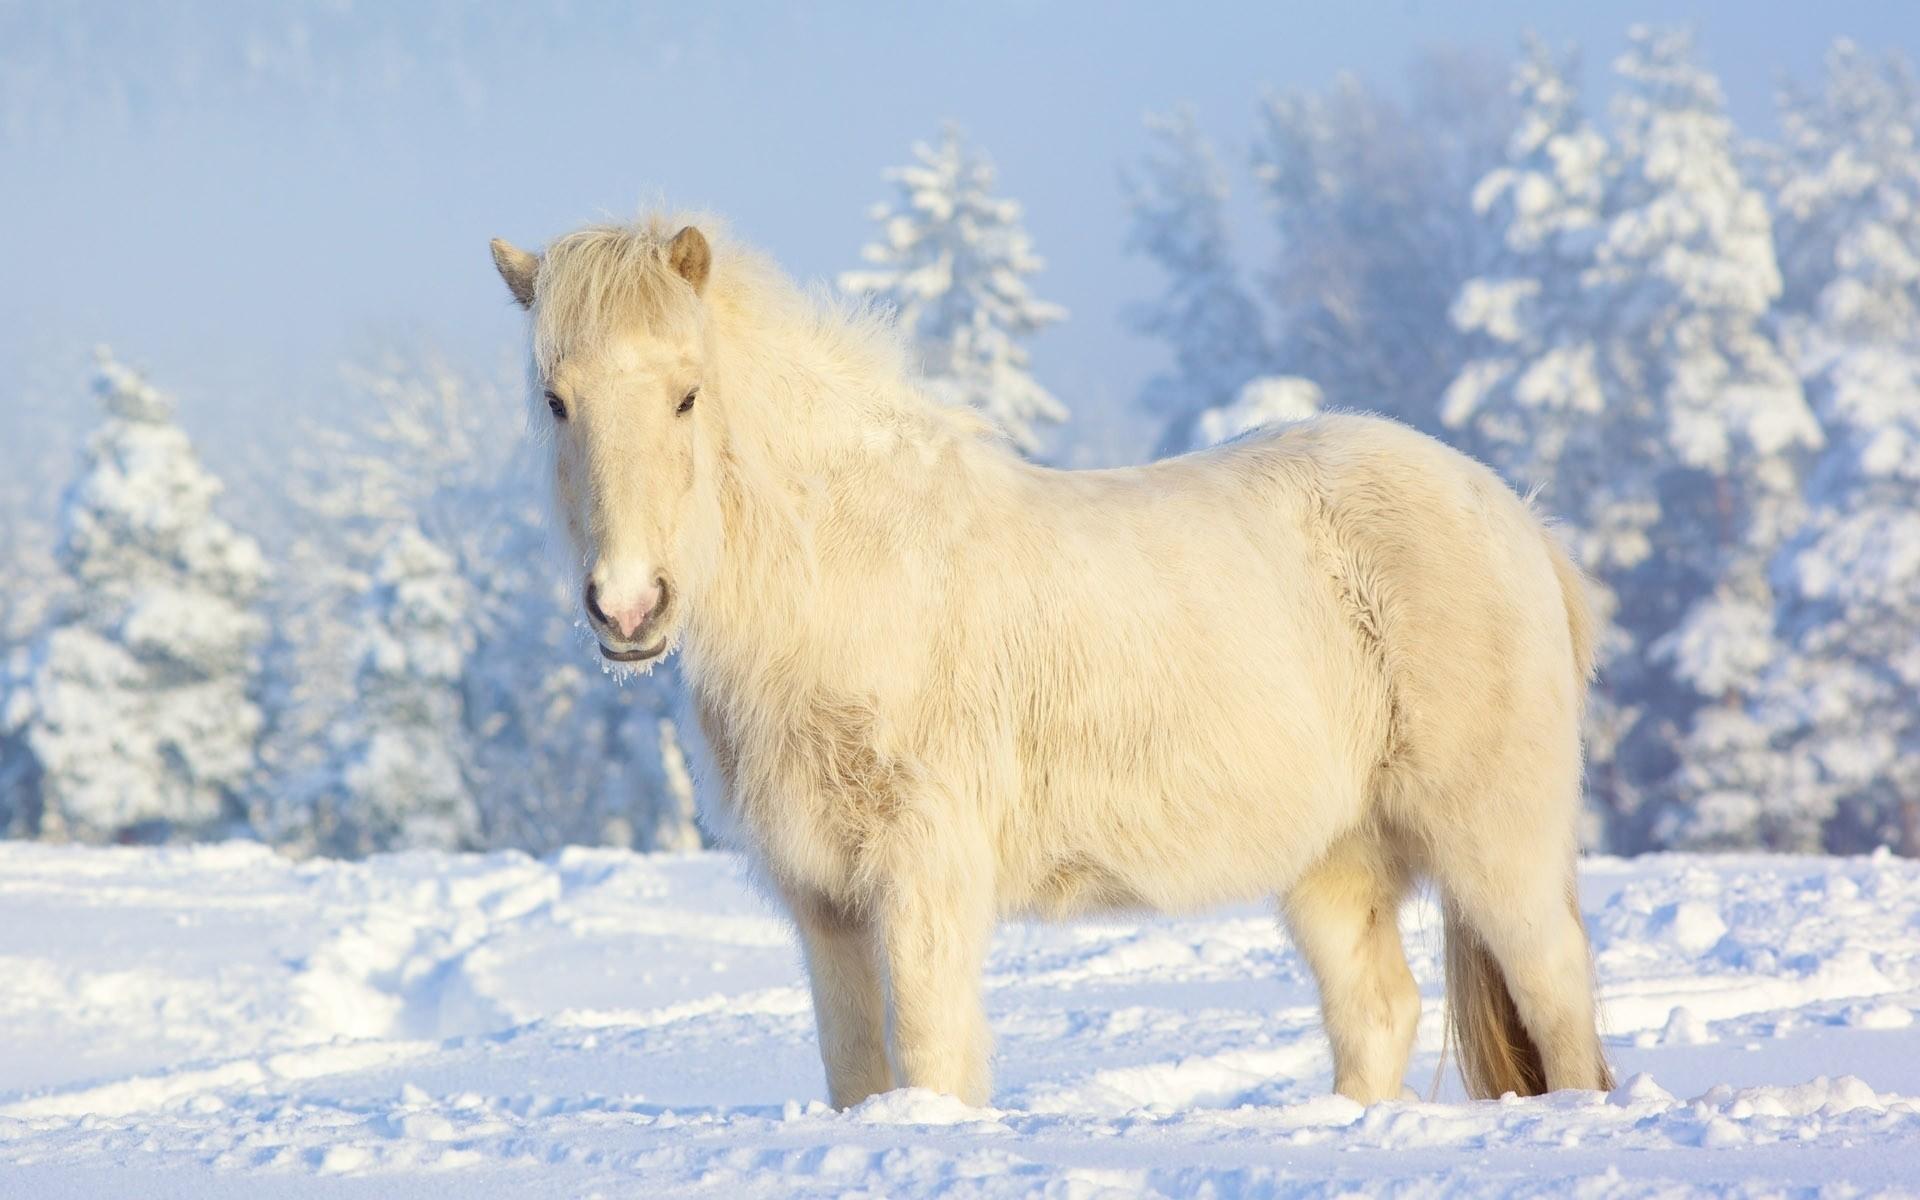 winter horse wallpaper (55+ images)